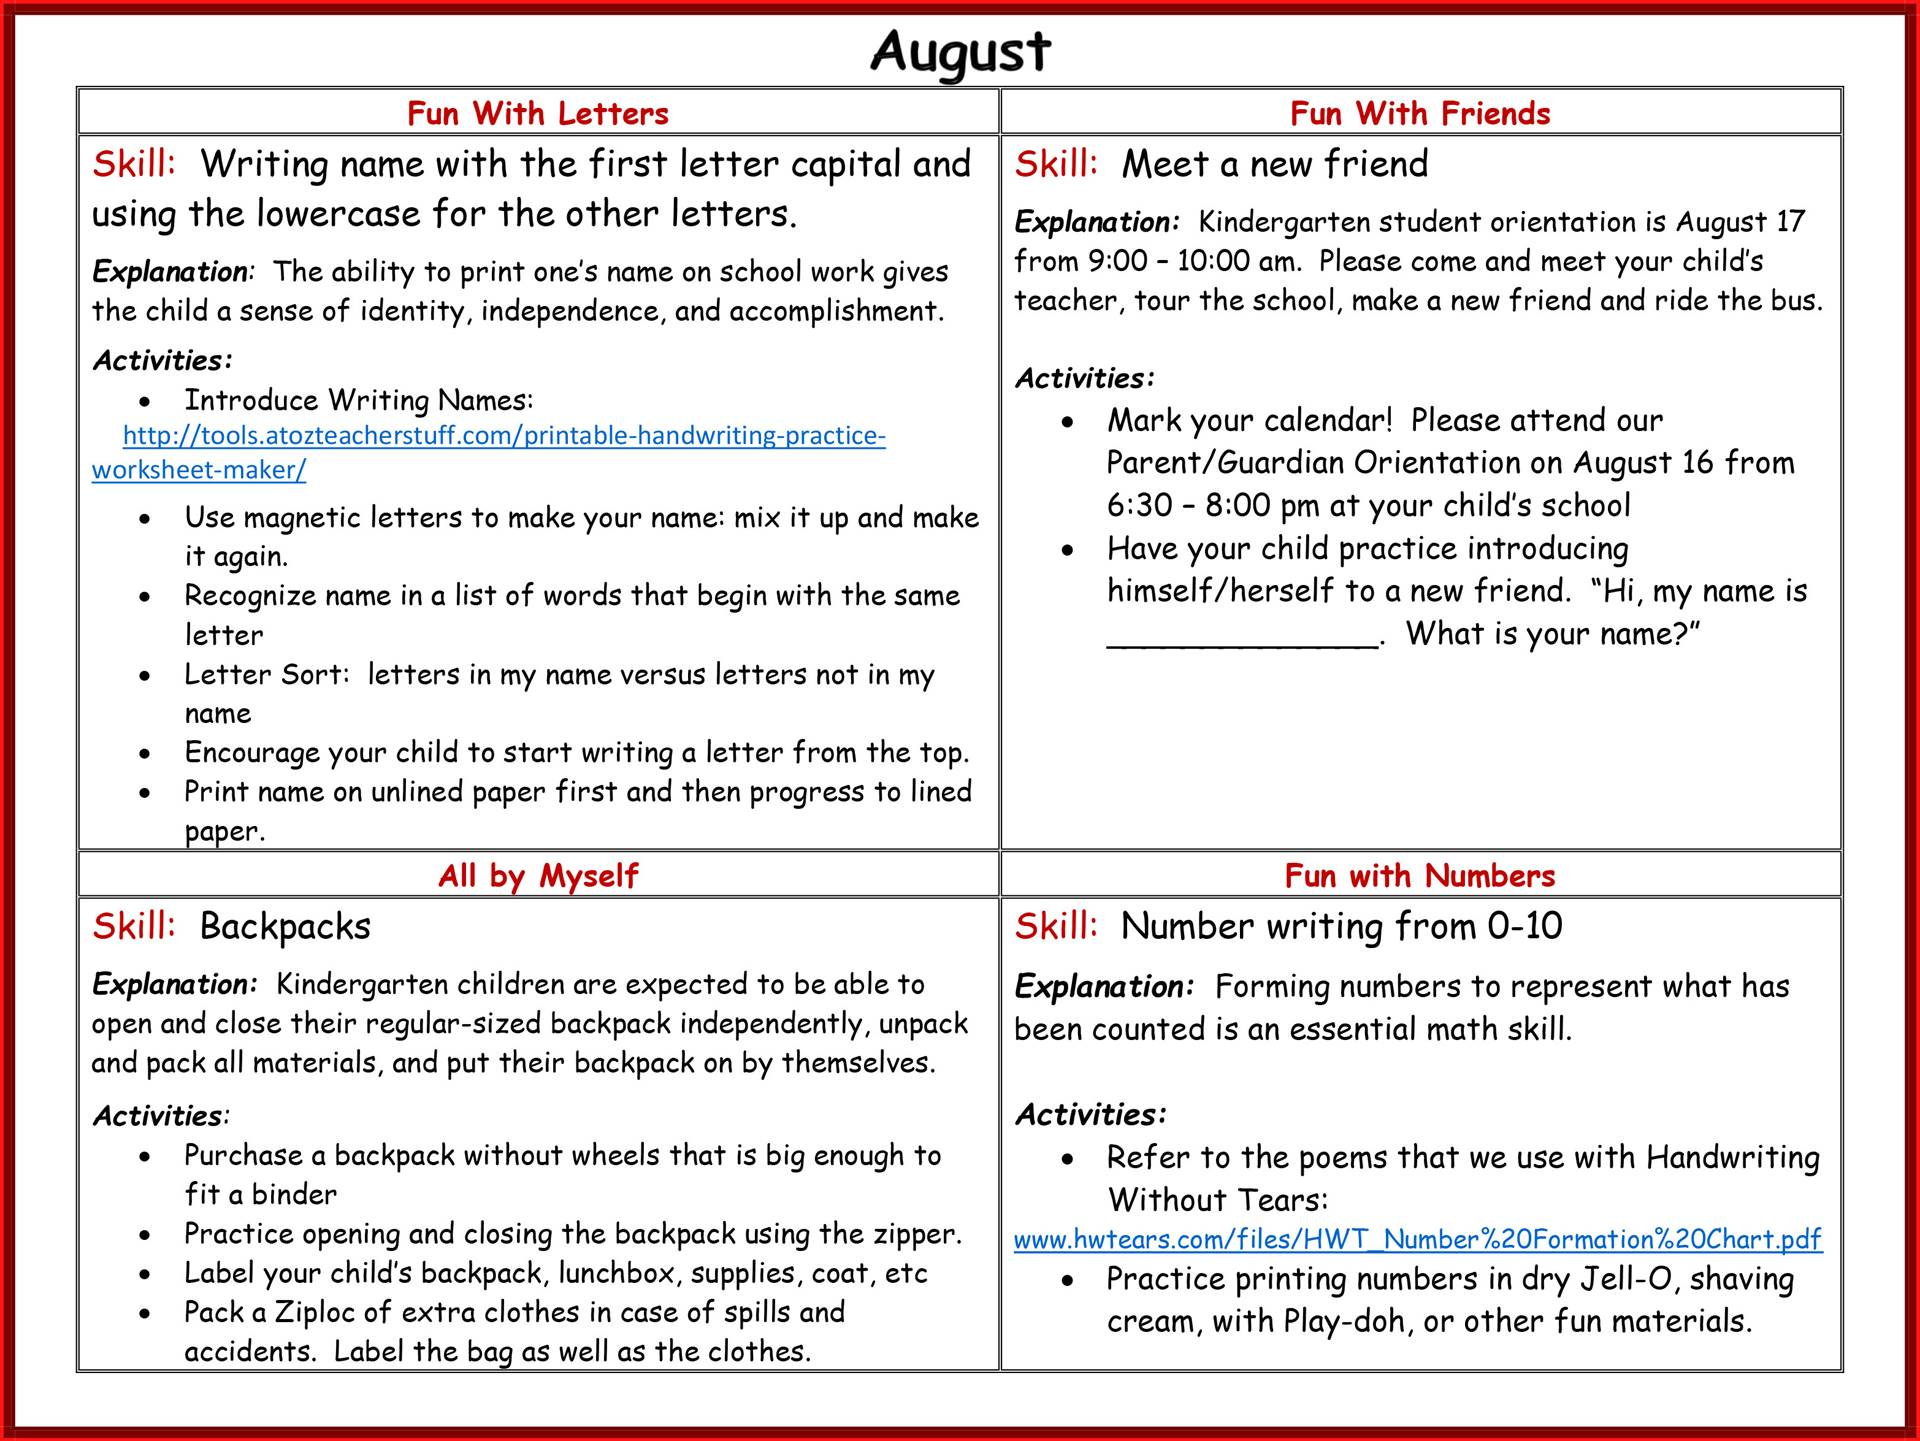 Kindergarten Readiness Calendar - August page 2